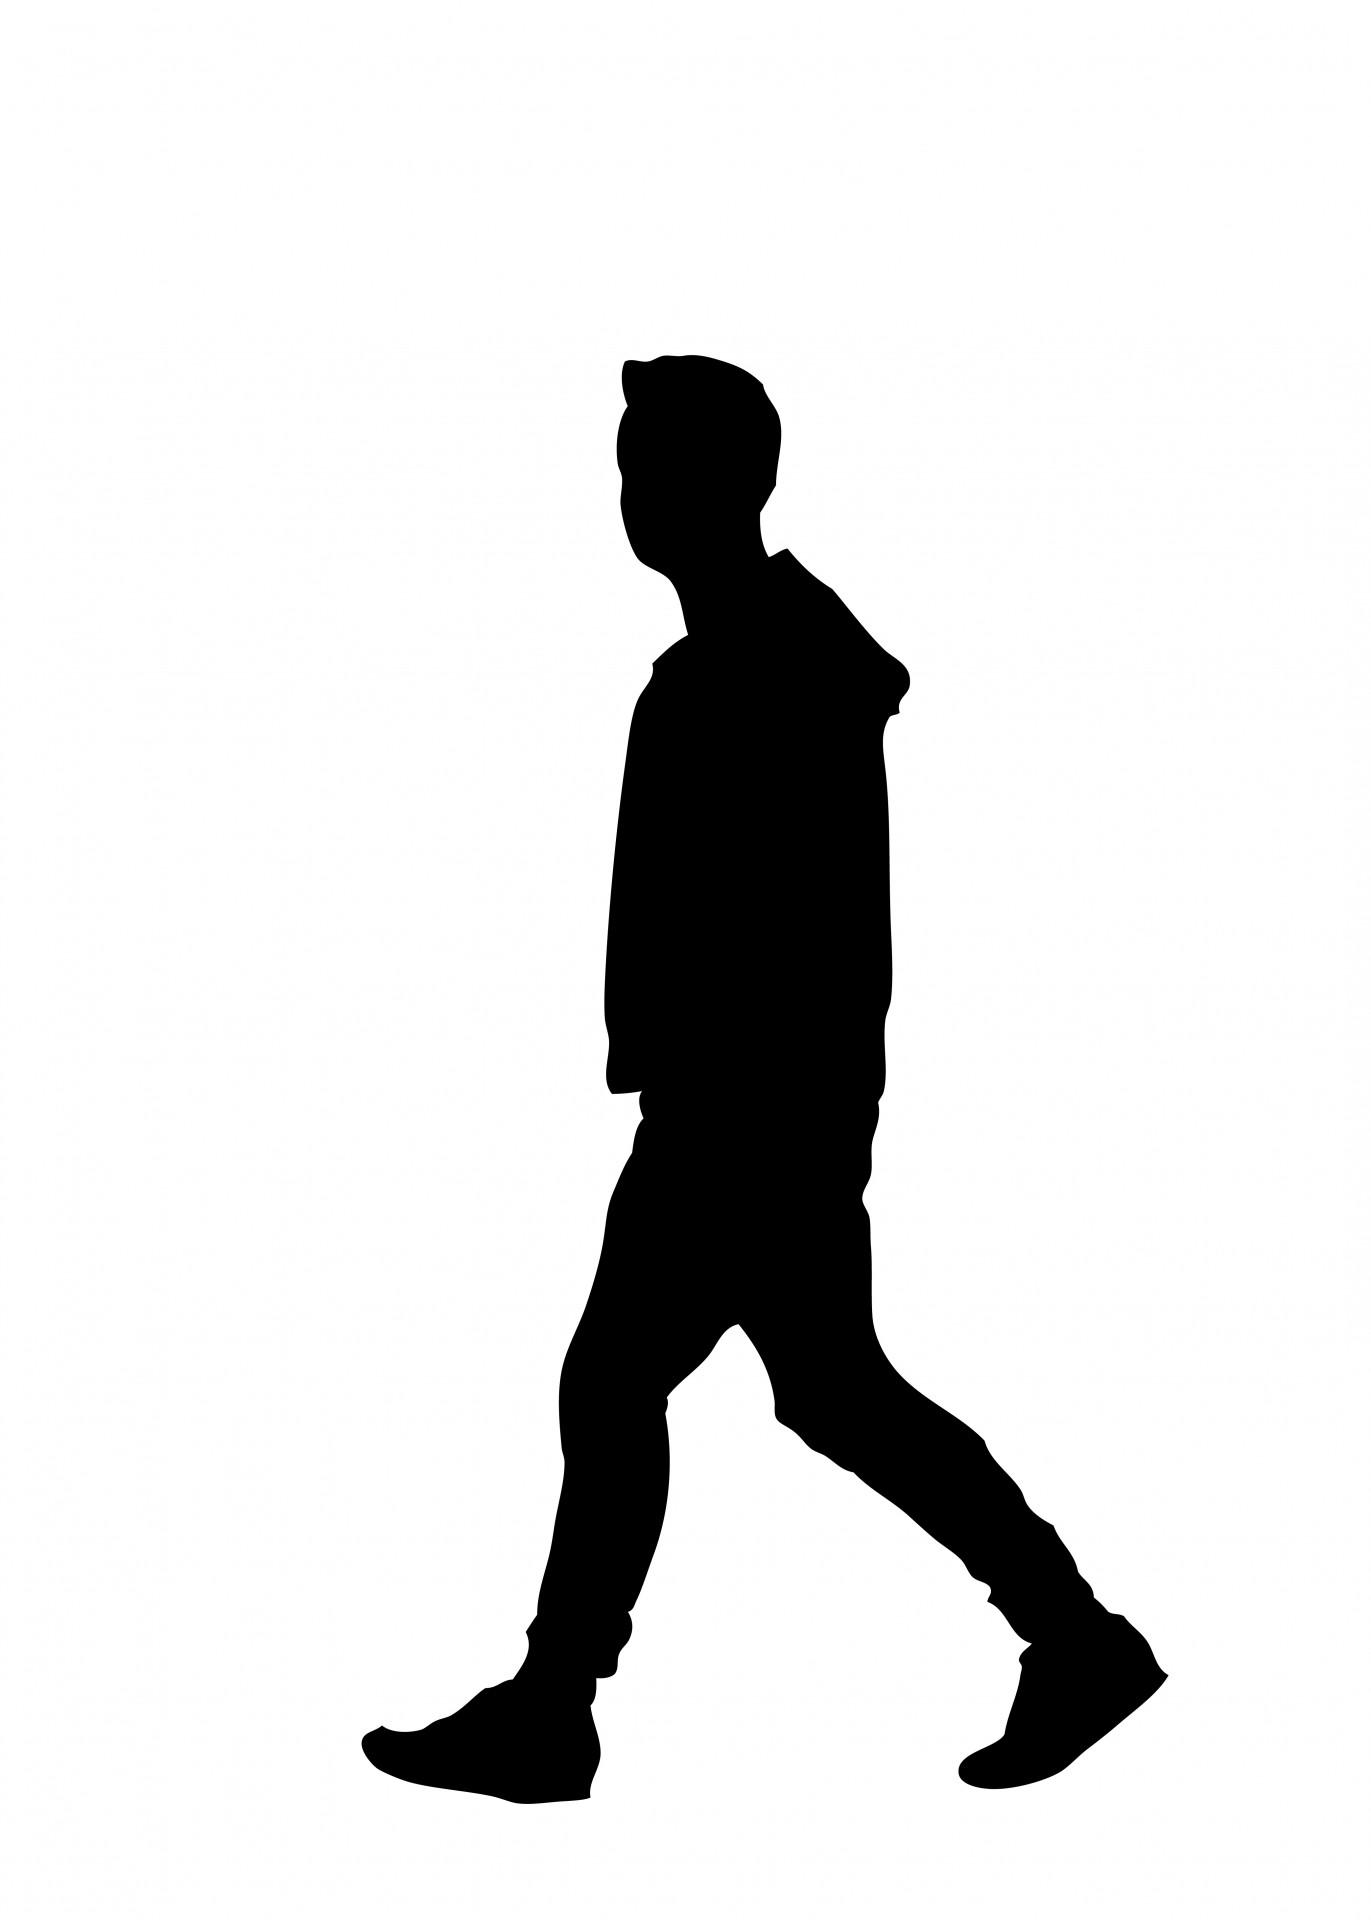 1371x1920 Man Walking Silhouette Clipart Free Stock Photo